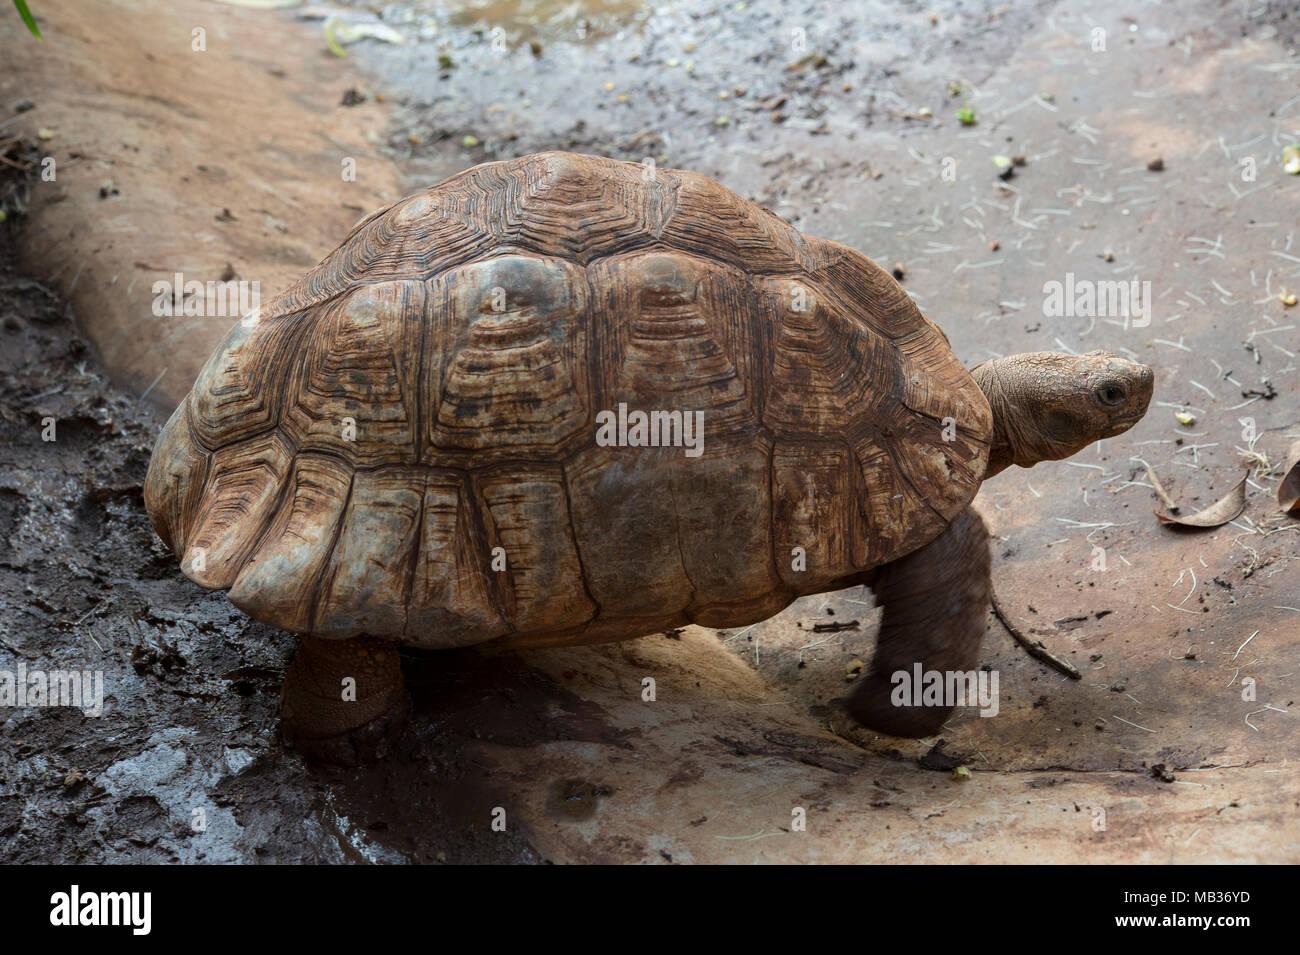 Leopard tortoise, Stigmochelys pardalis, Testudinidae, Kenya, Africa Stock Photo